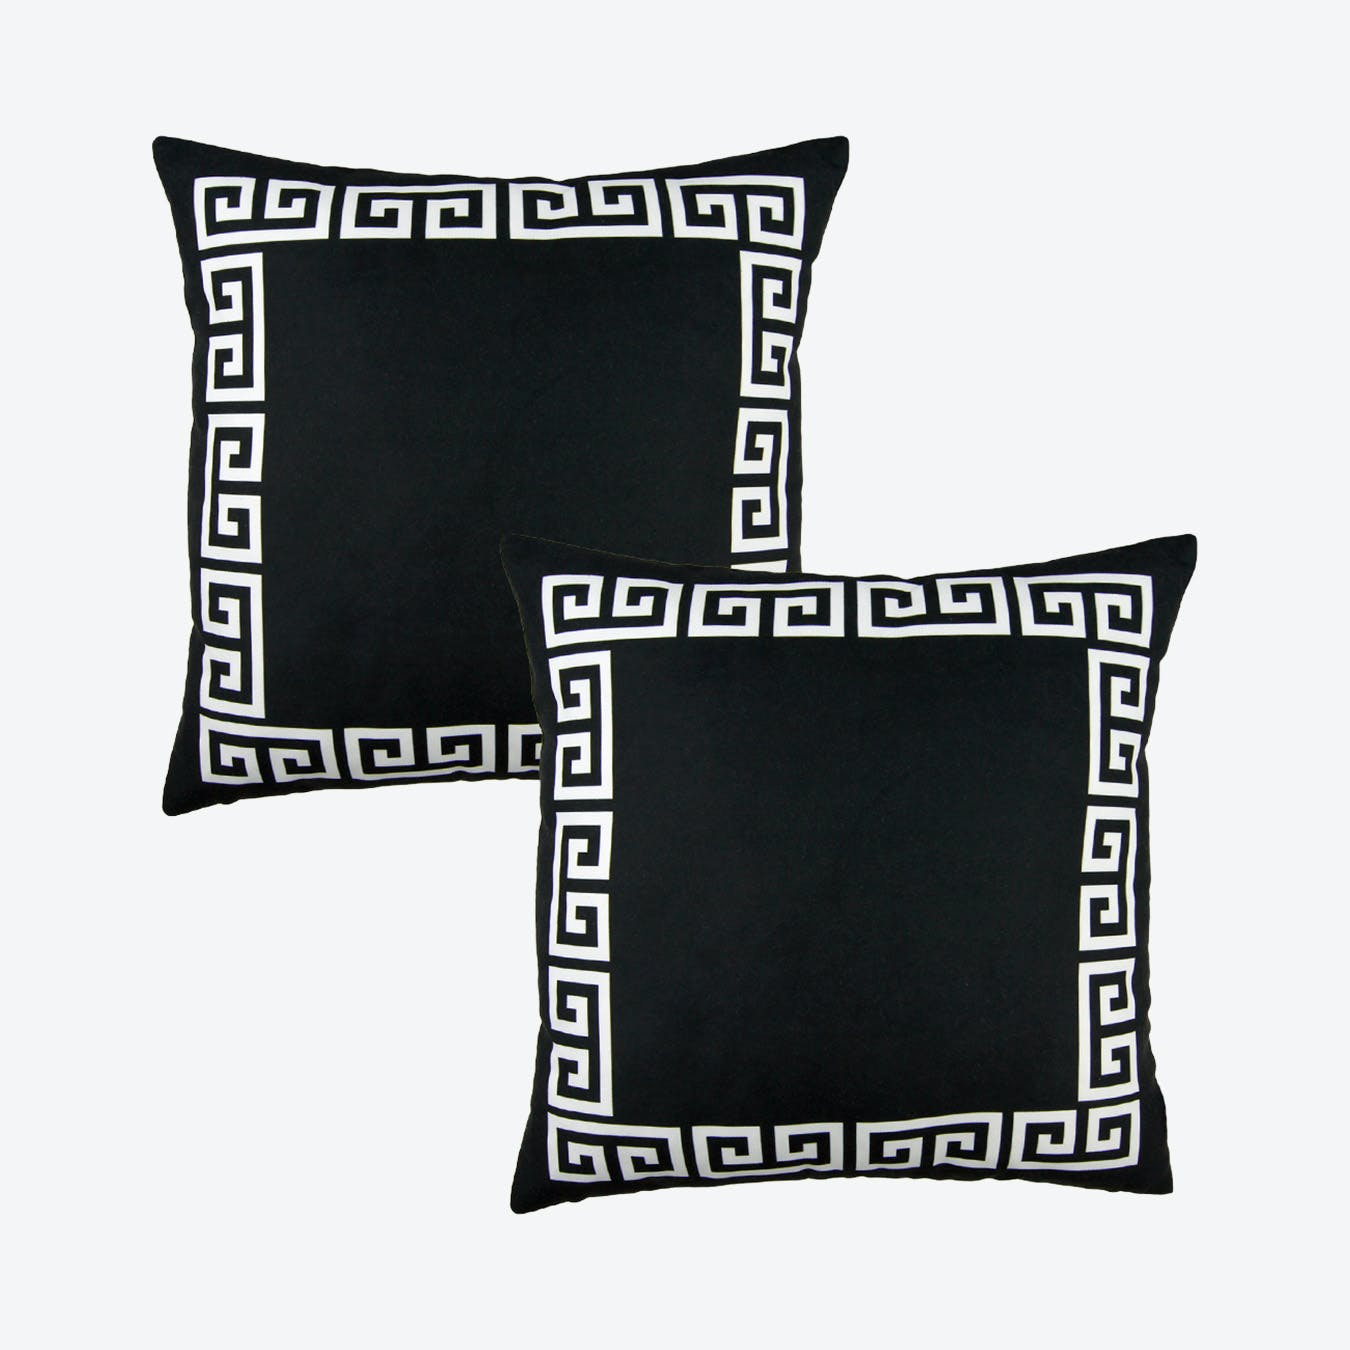 geometric greek key square throw pillow covers black white set of 2